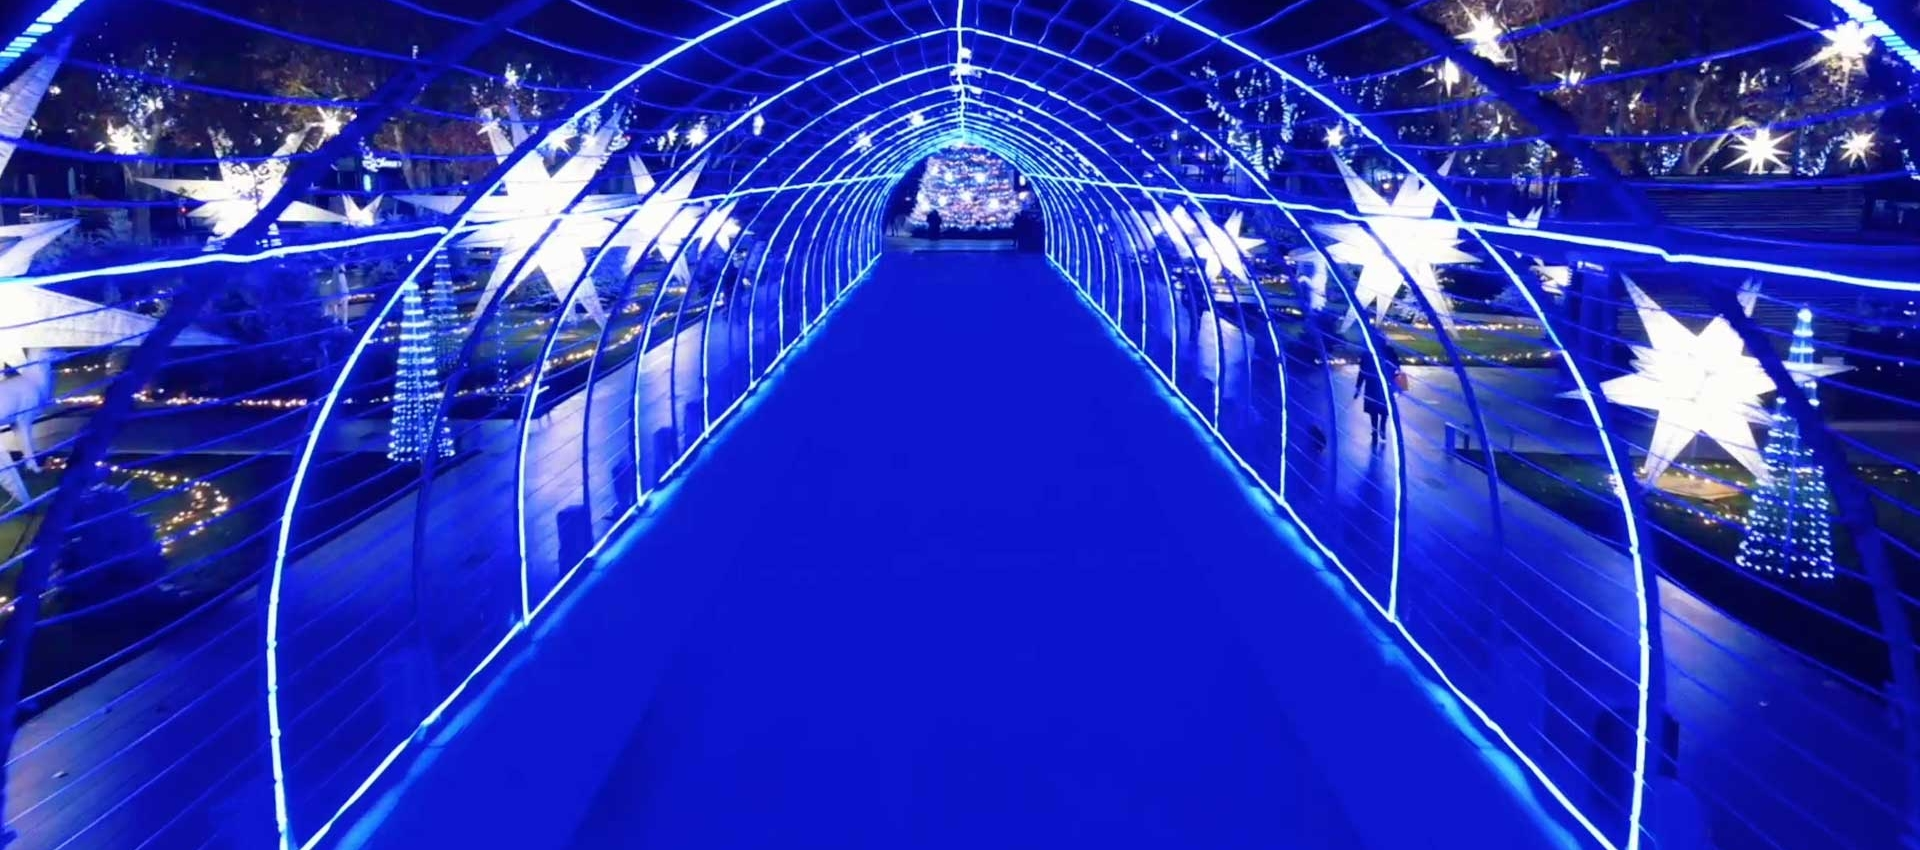 tunnel_magique_01_